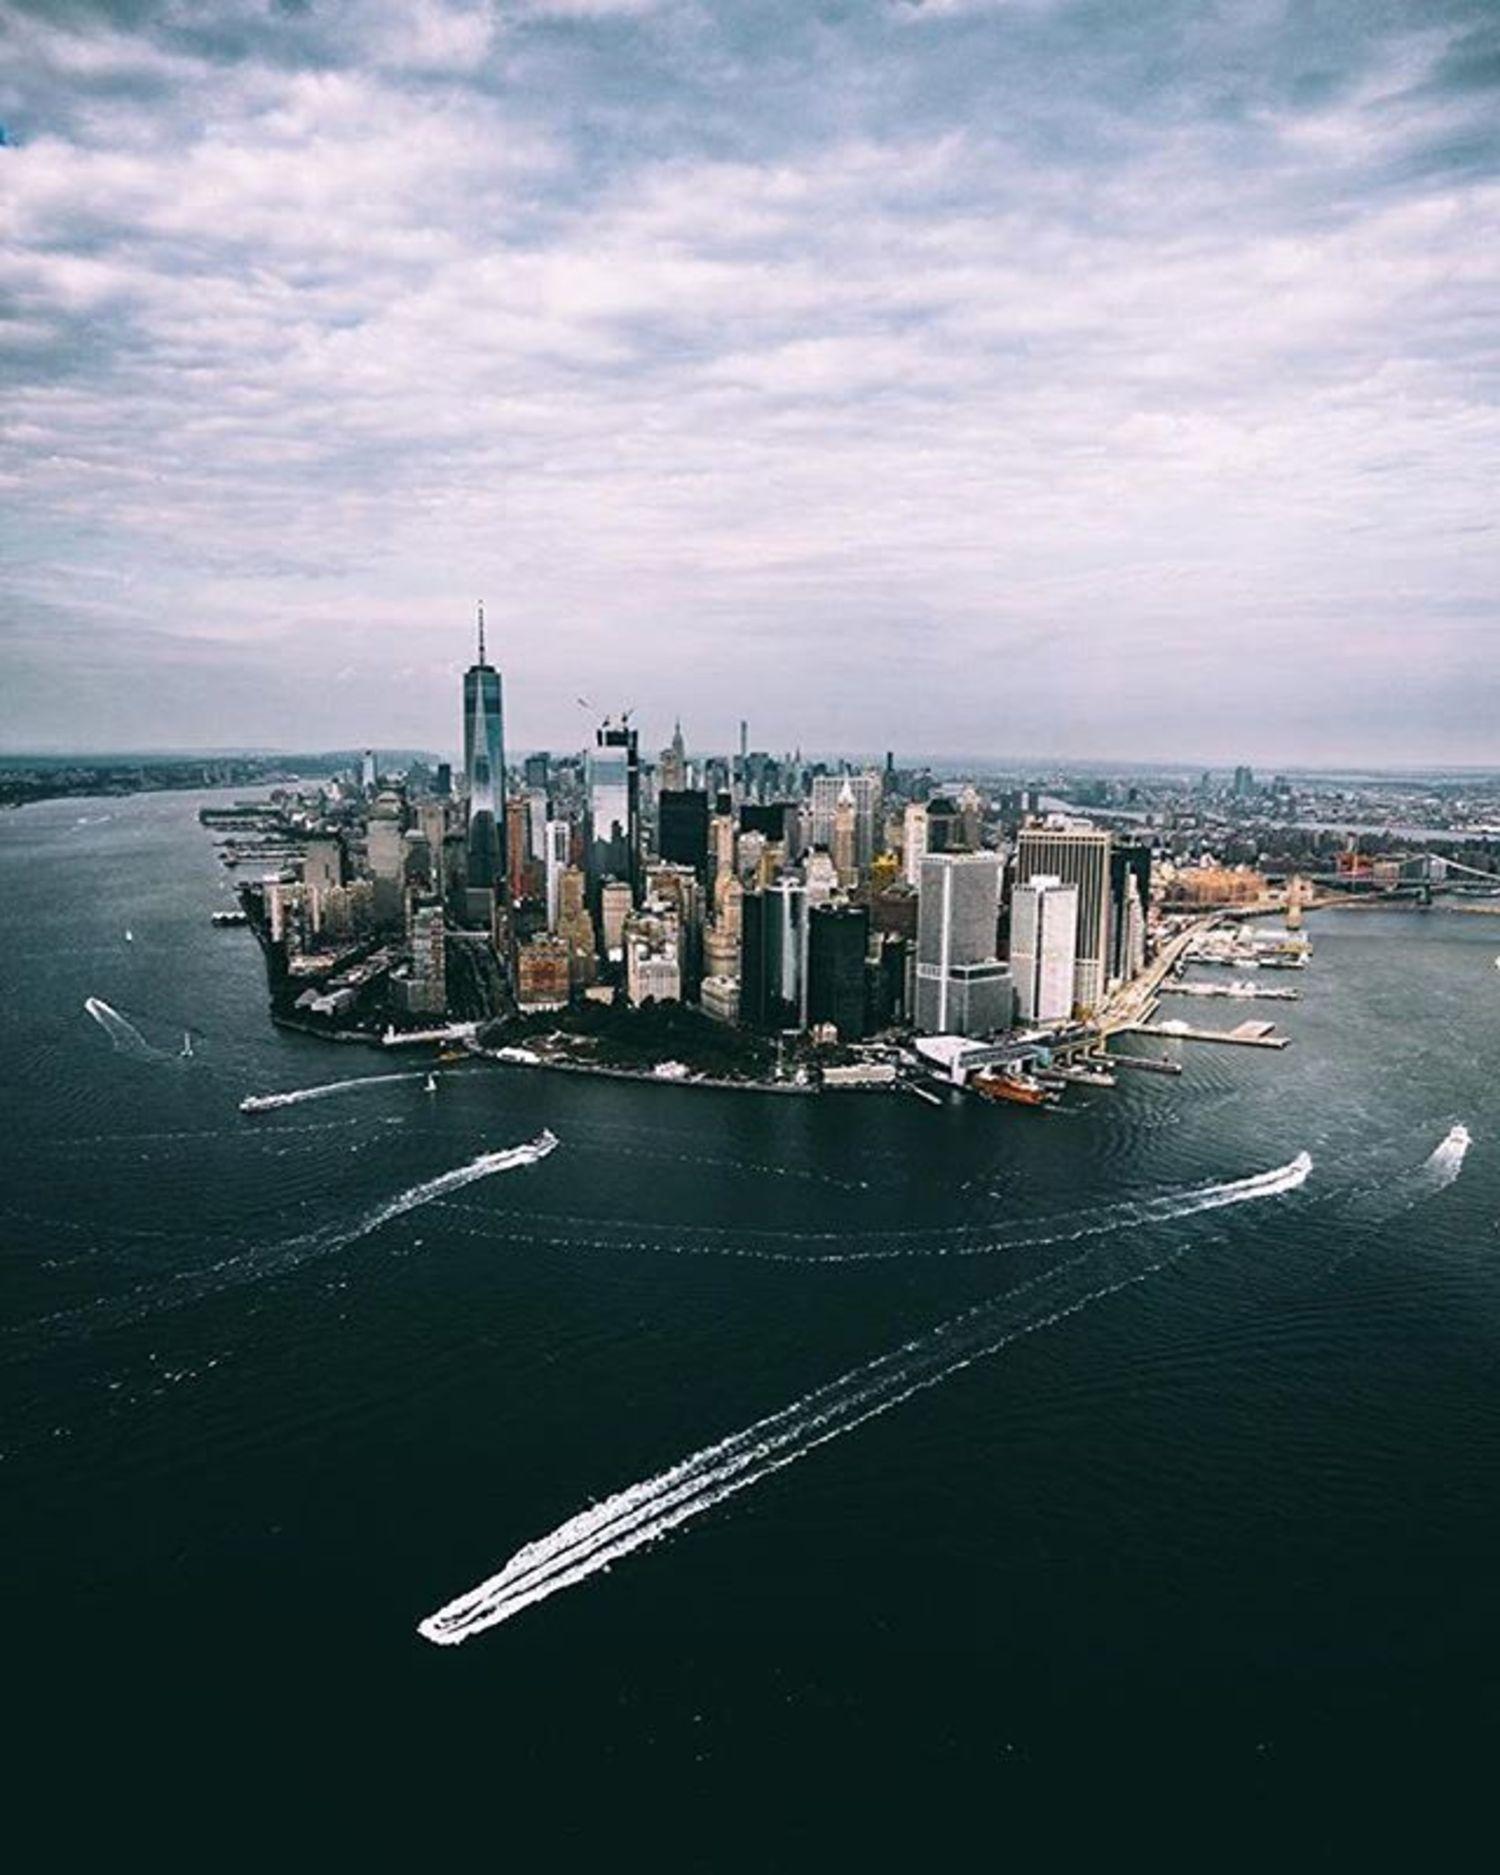 New York, New York. Photo via @henrykornaros #viewingnyc #newyorkcity #newyork